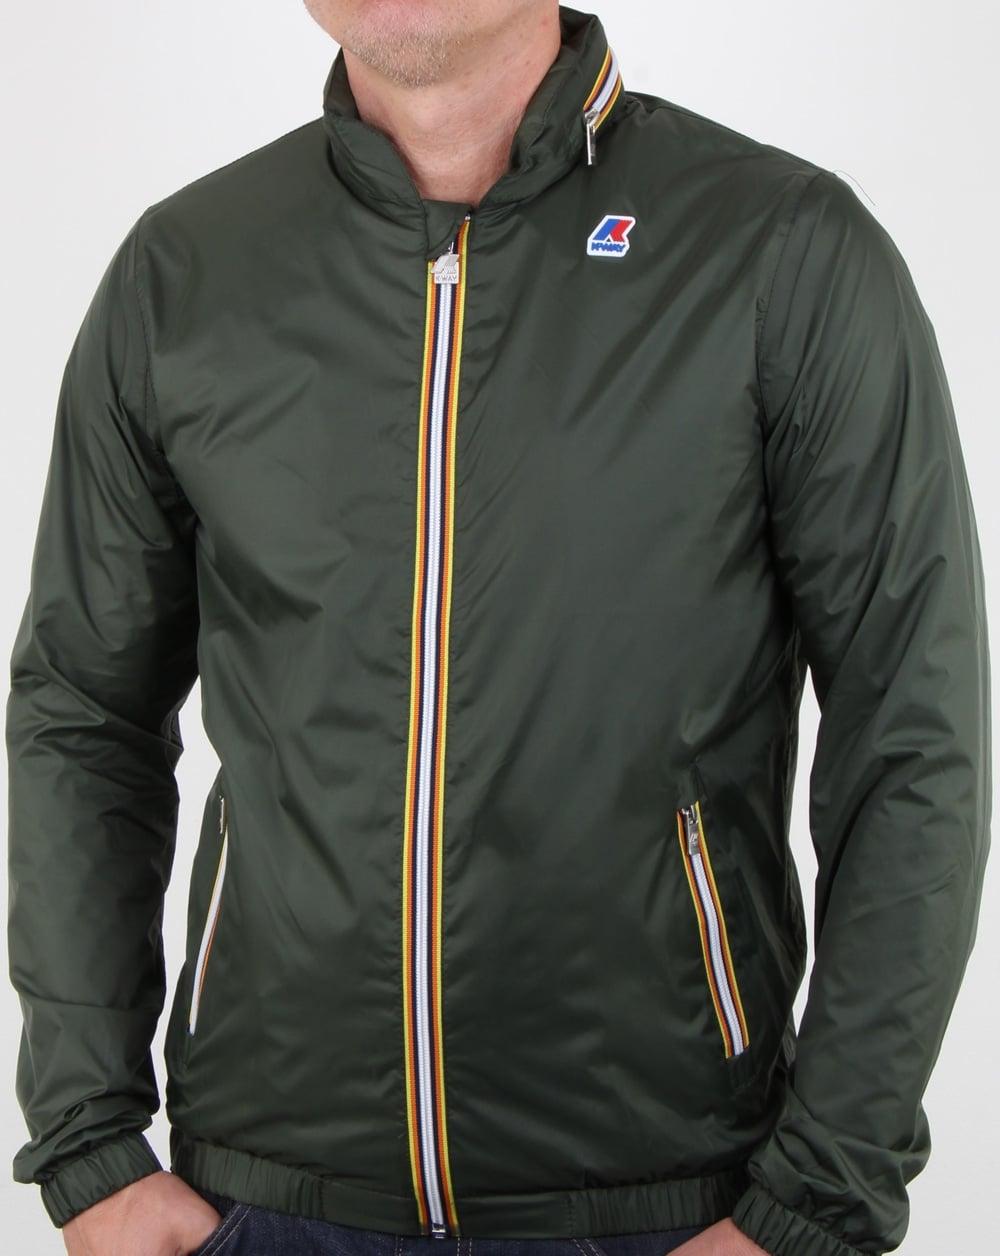 28b85cbf7 K-way Full Zip Phillippe Nylon Jacket Dark Green